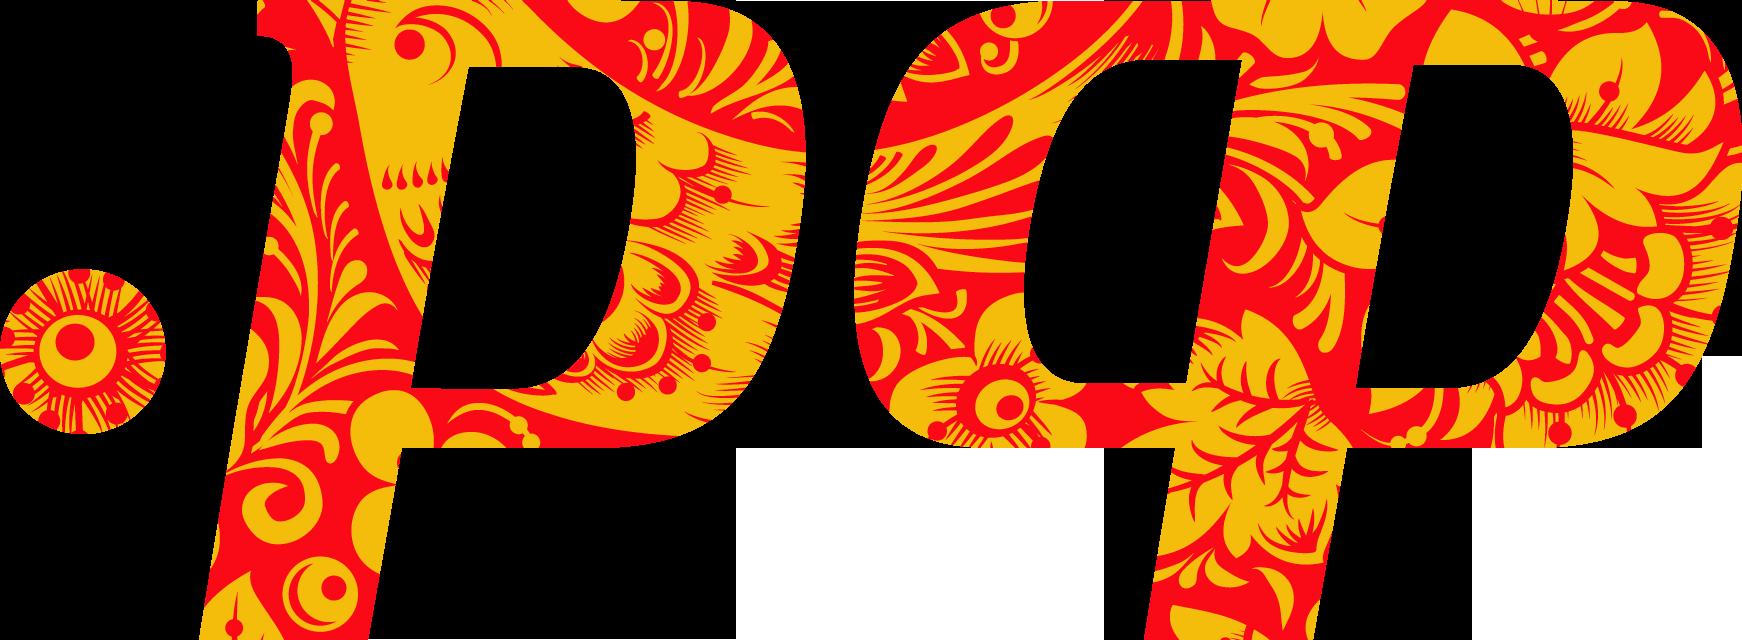 rf-domain